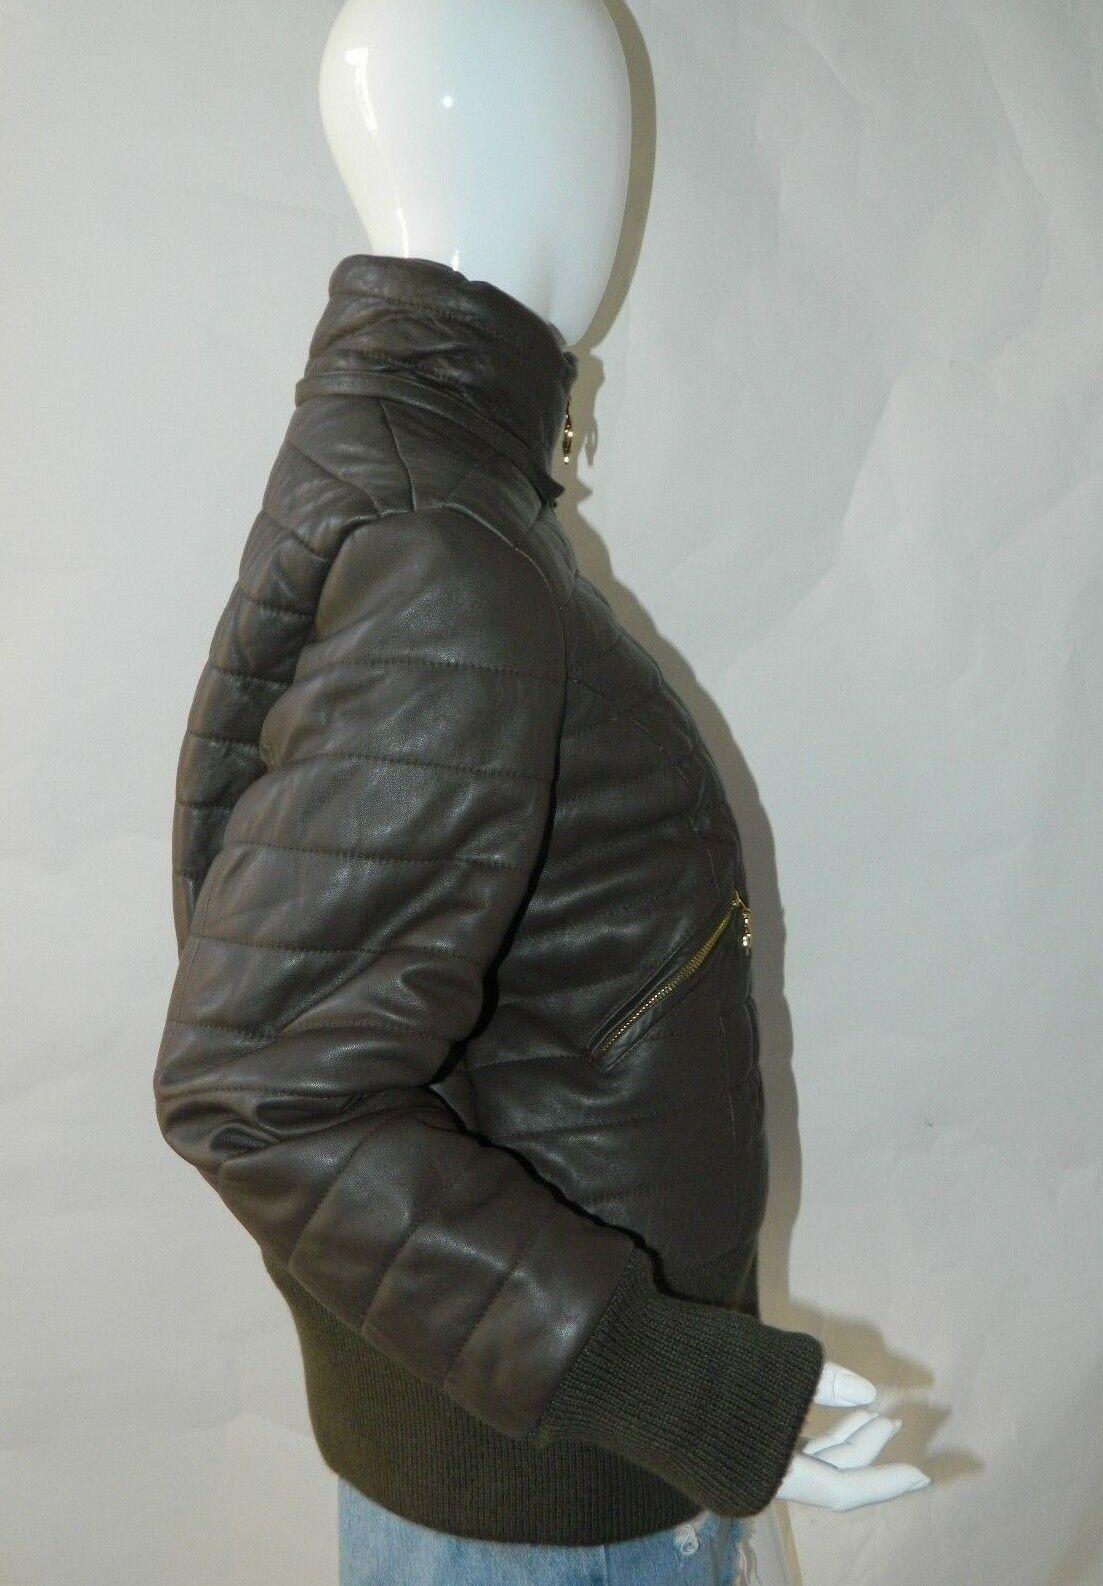 BABY PHAT Jacket Puffer Leather Kimora Lee Simmons Brown Coat XX-Large image 8